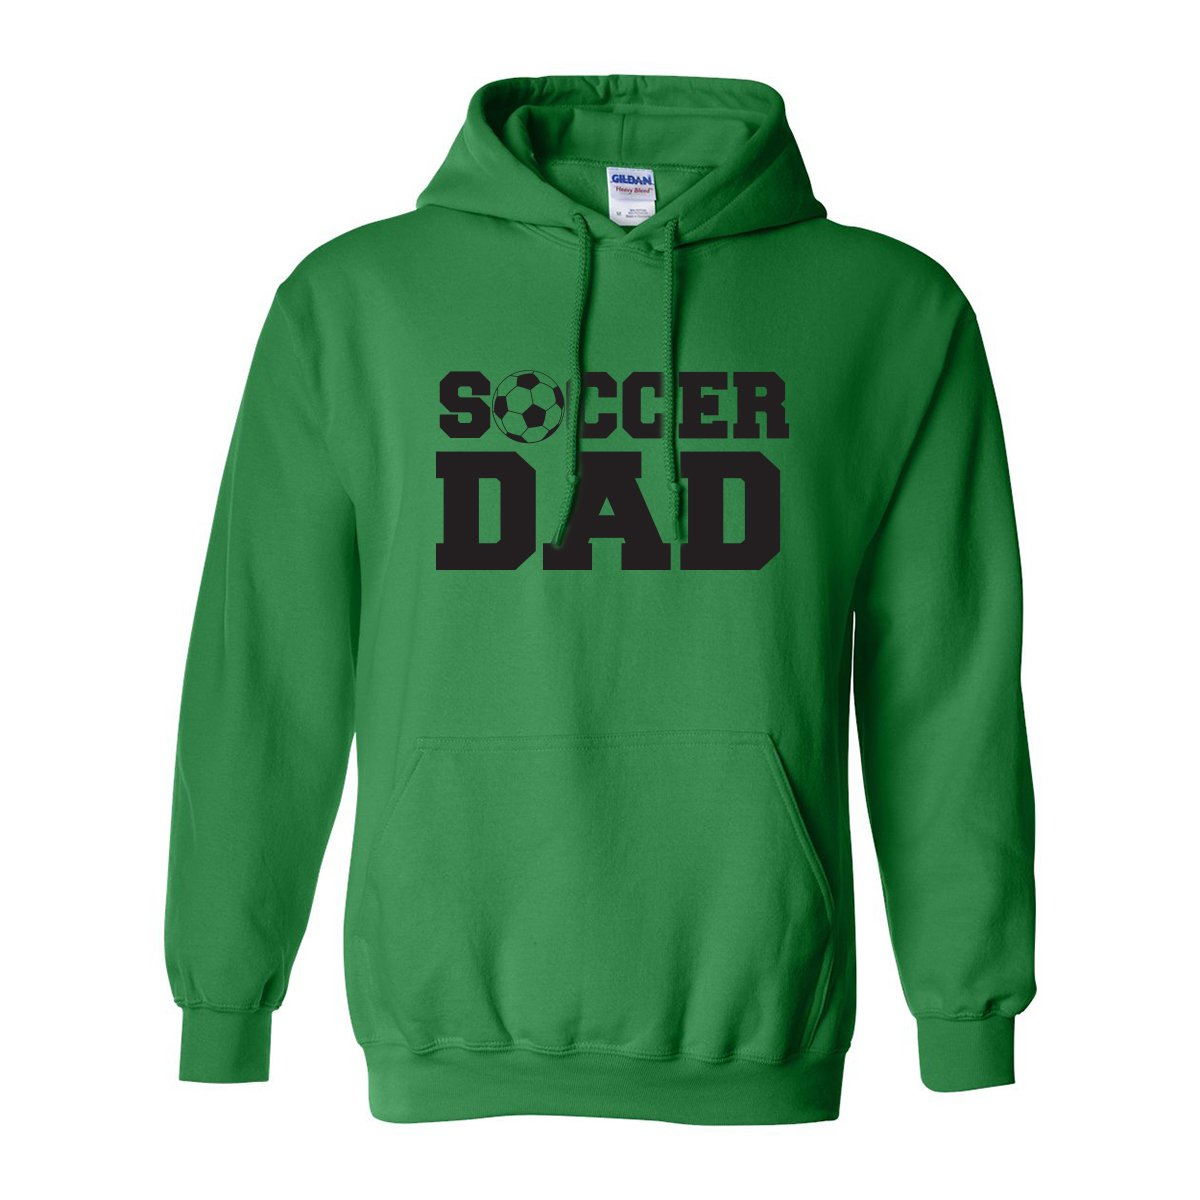 ZeroGravitee Soccer Dad Adult Hooded Sweatshirt in 9 colors PA-1908